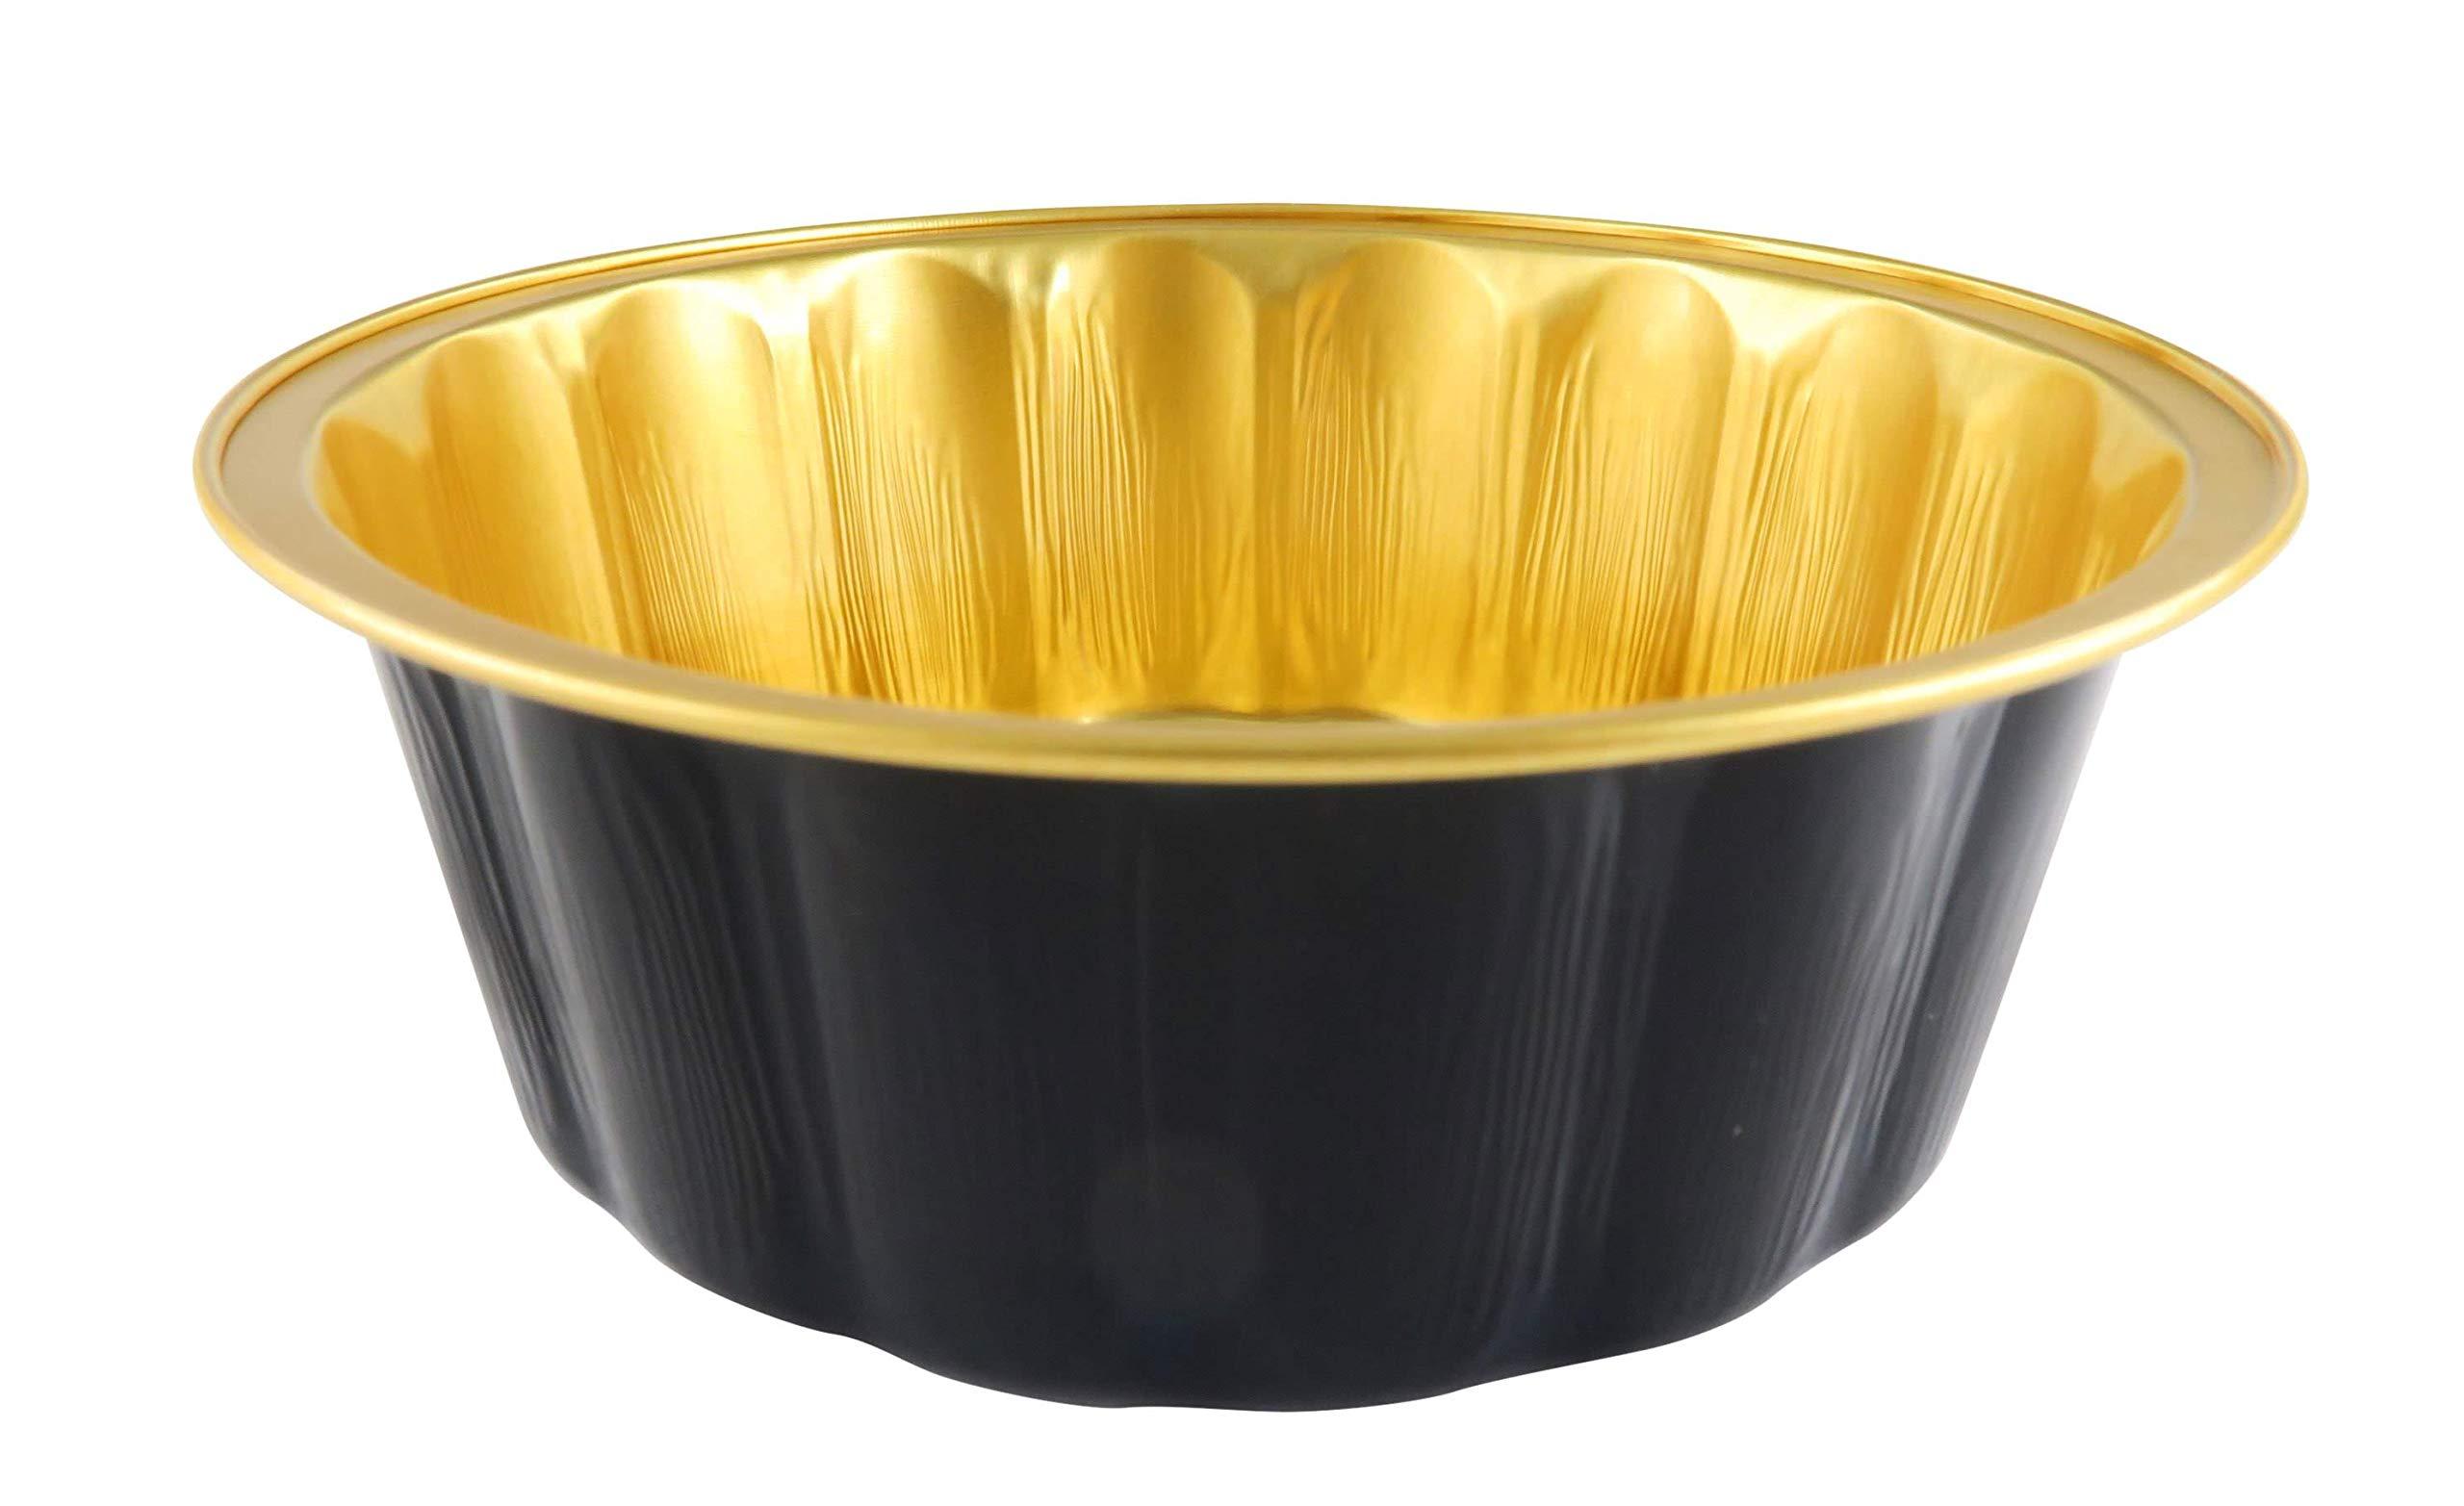 KitchenDance Disposable Colored Aluminum 8 oz. Individual Cake Cups- Tart Pans-Dessert Pans. Color and Lid Options #A8 (100, Black & Gold Without Lids)